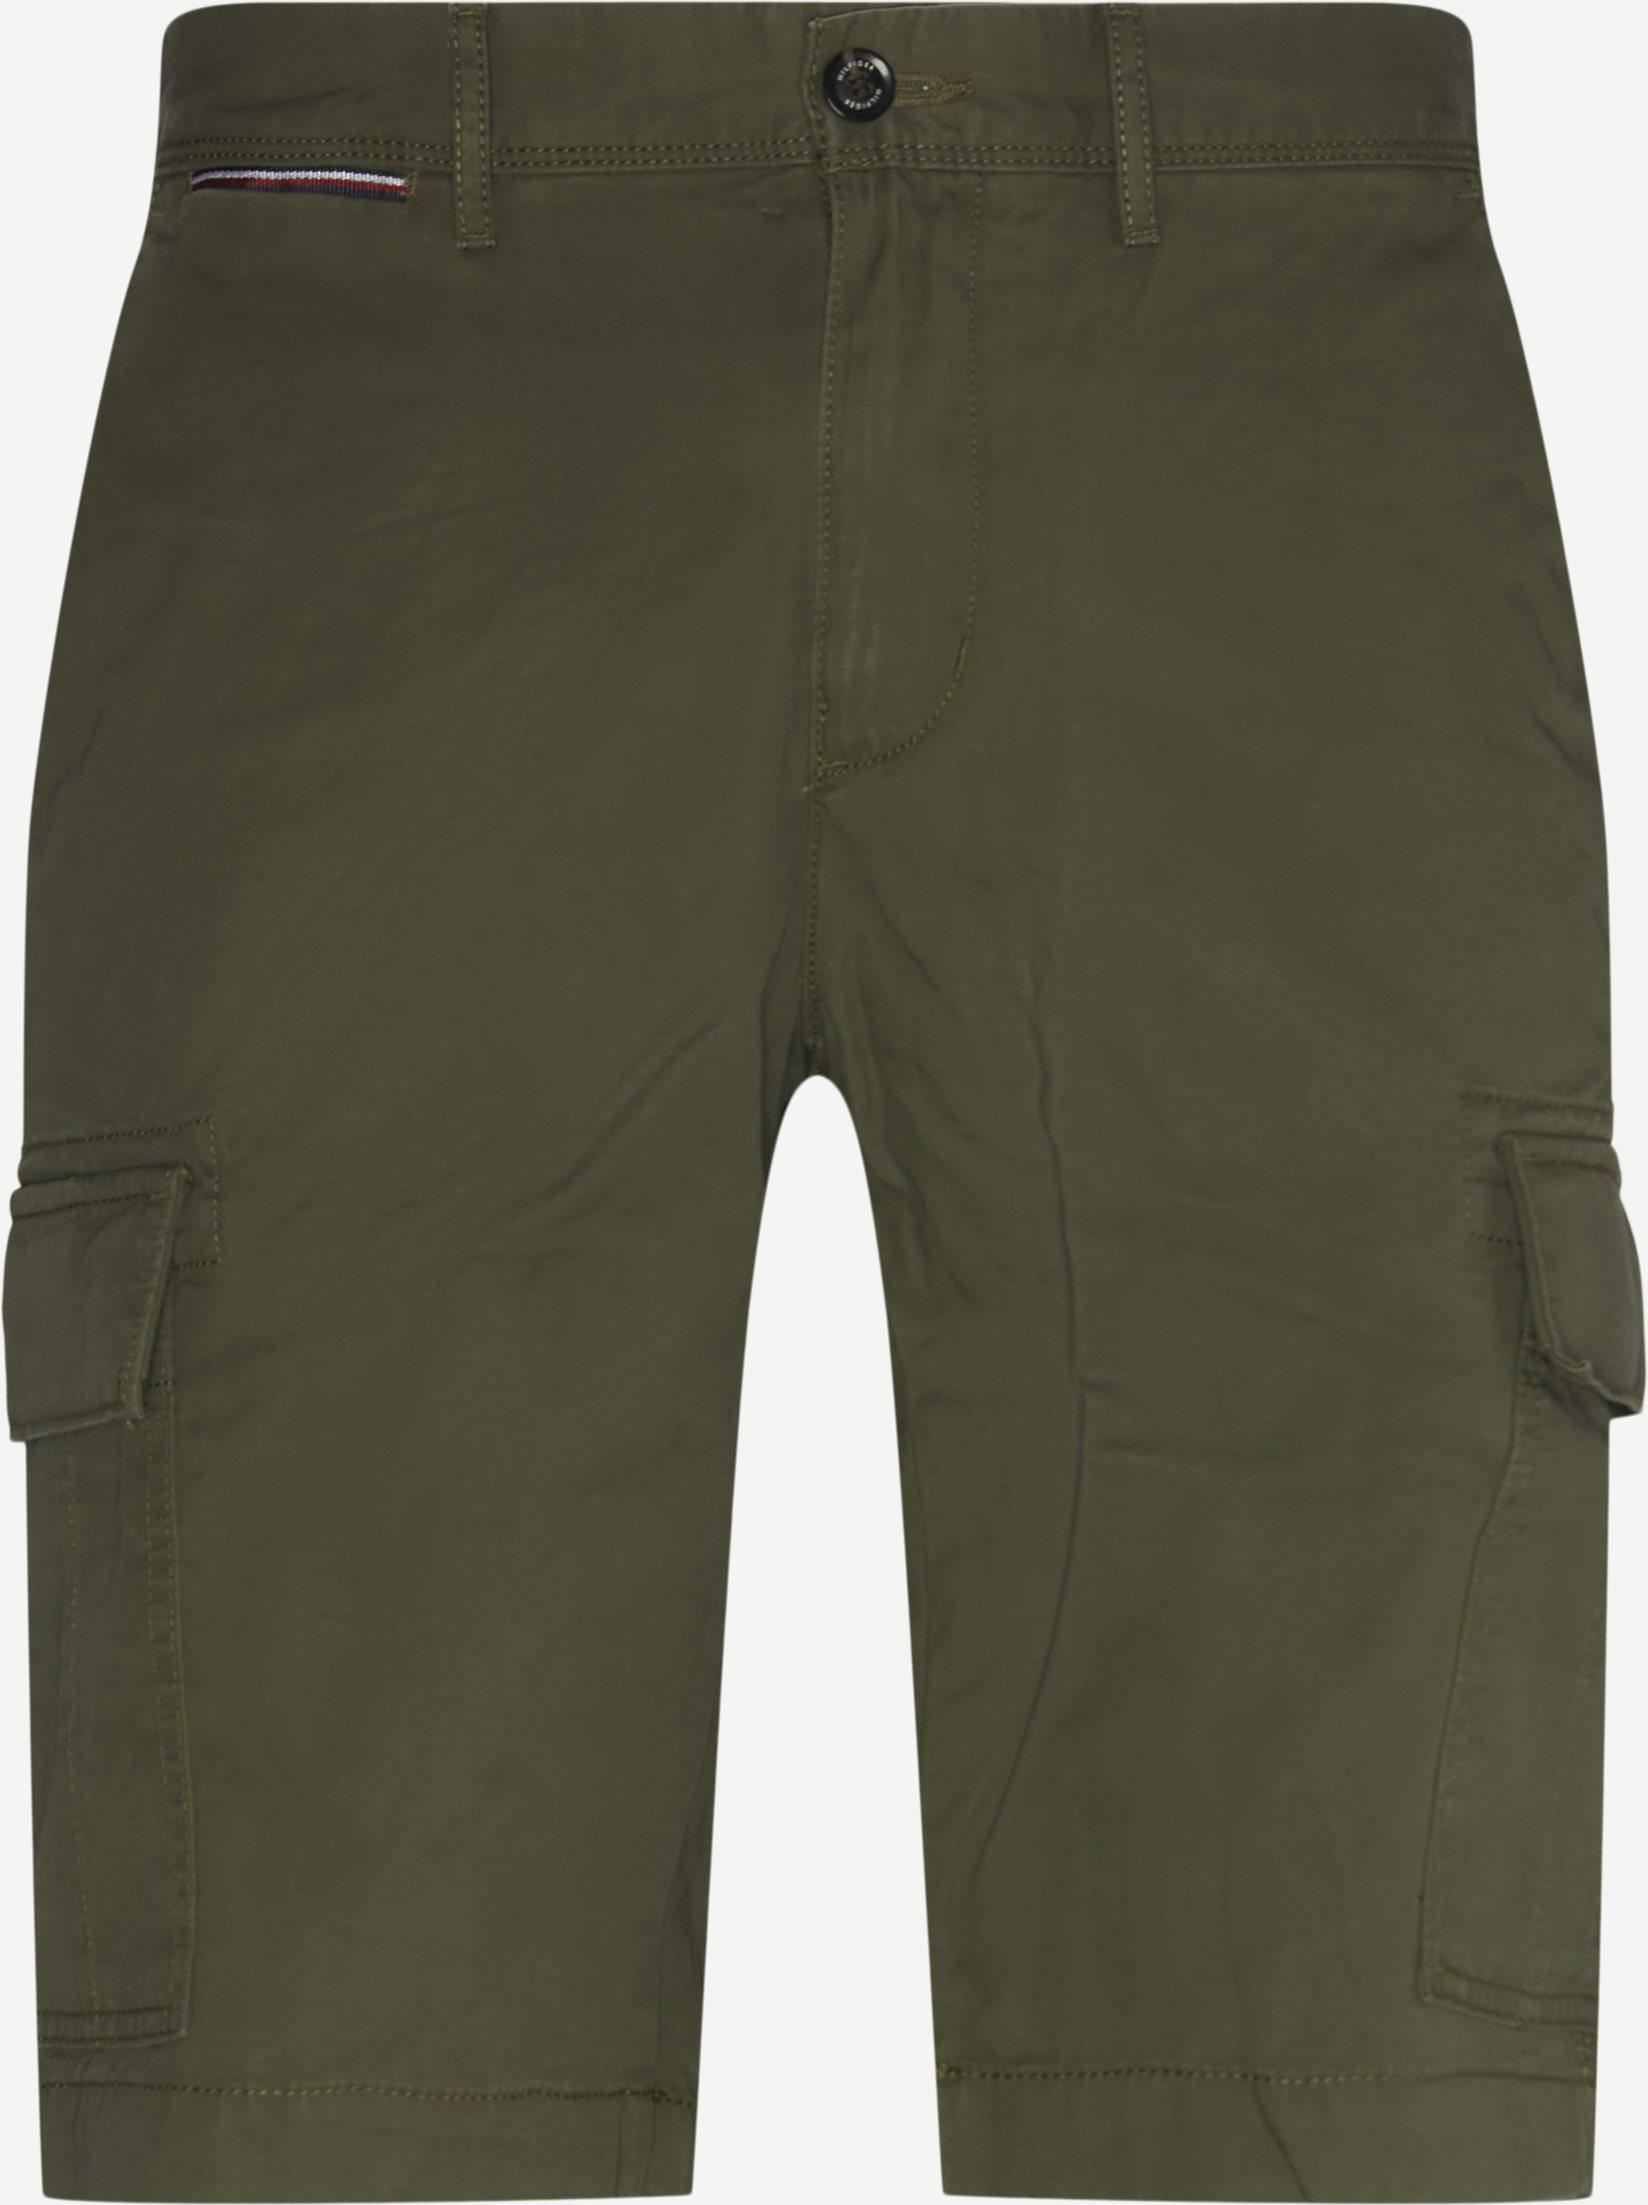 John Cargo Shorts - Shorts - Regular fit - Army